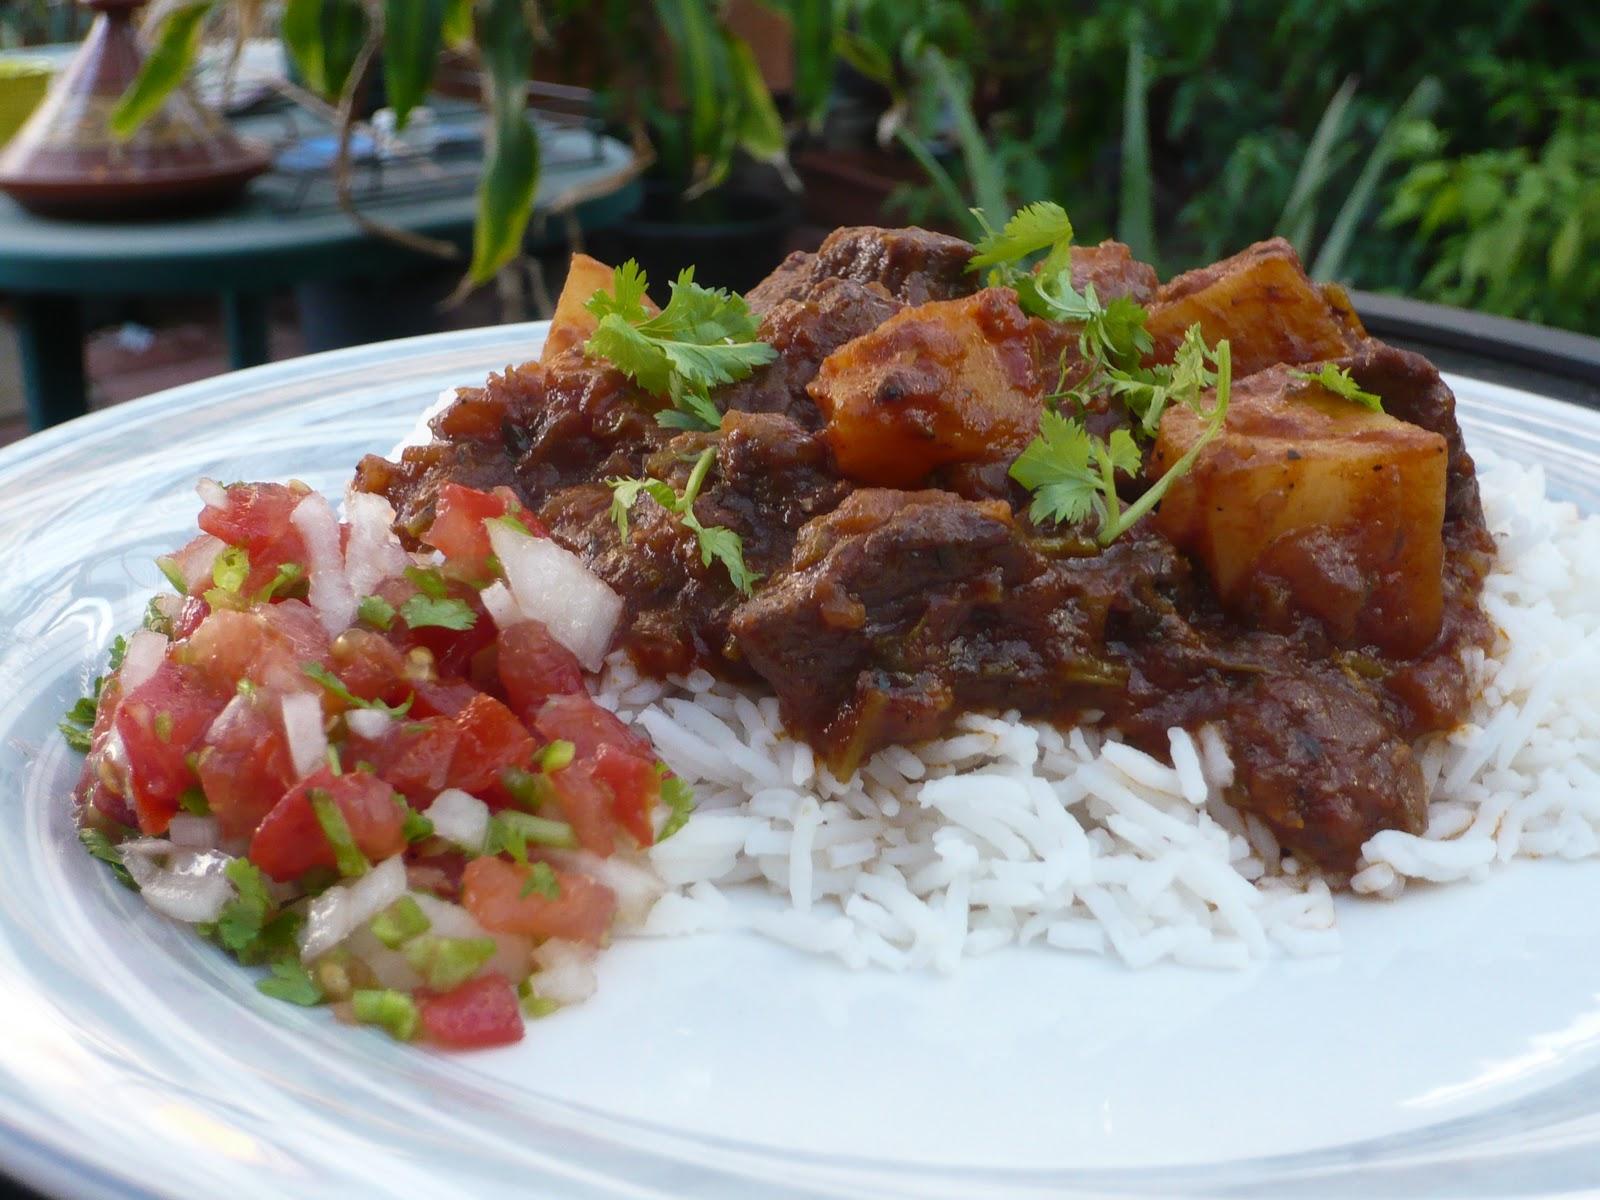 Caripoule mauritian food blog daube de boeuf avec pommes - Cuisine avec presqu ile ...